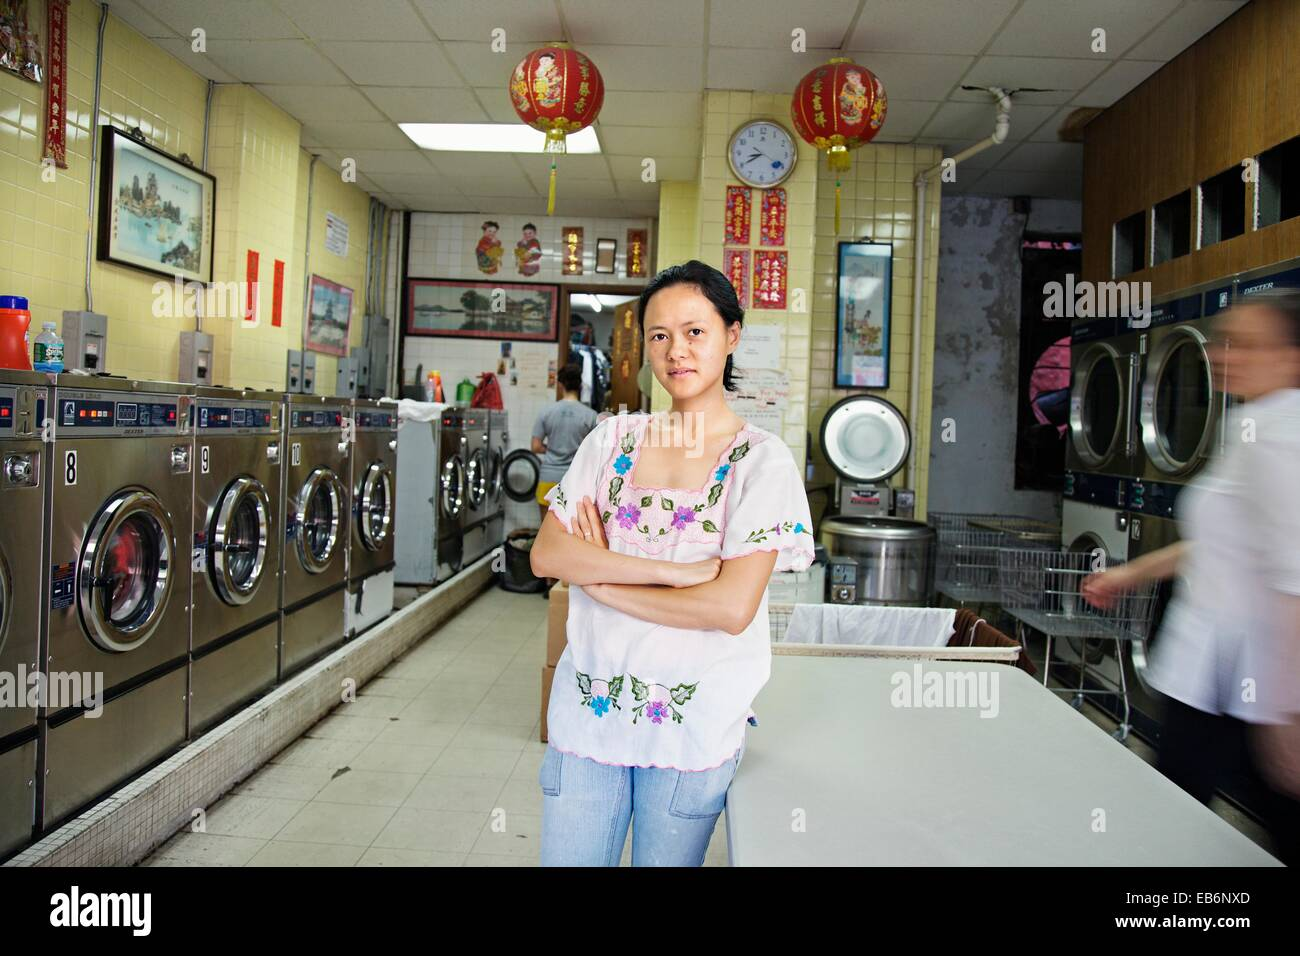 Laundry shop stock photos laundry shop stock images alamy laundry chinatown manhattan new york city usa stock image solutioingenieria Gallery